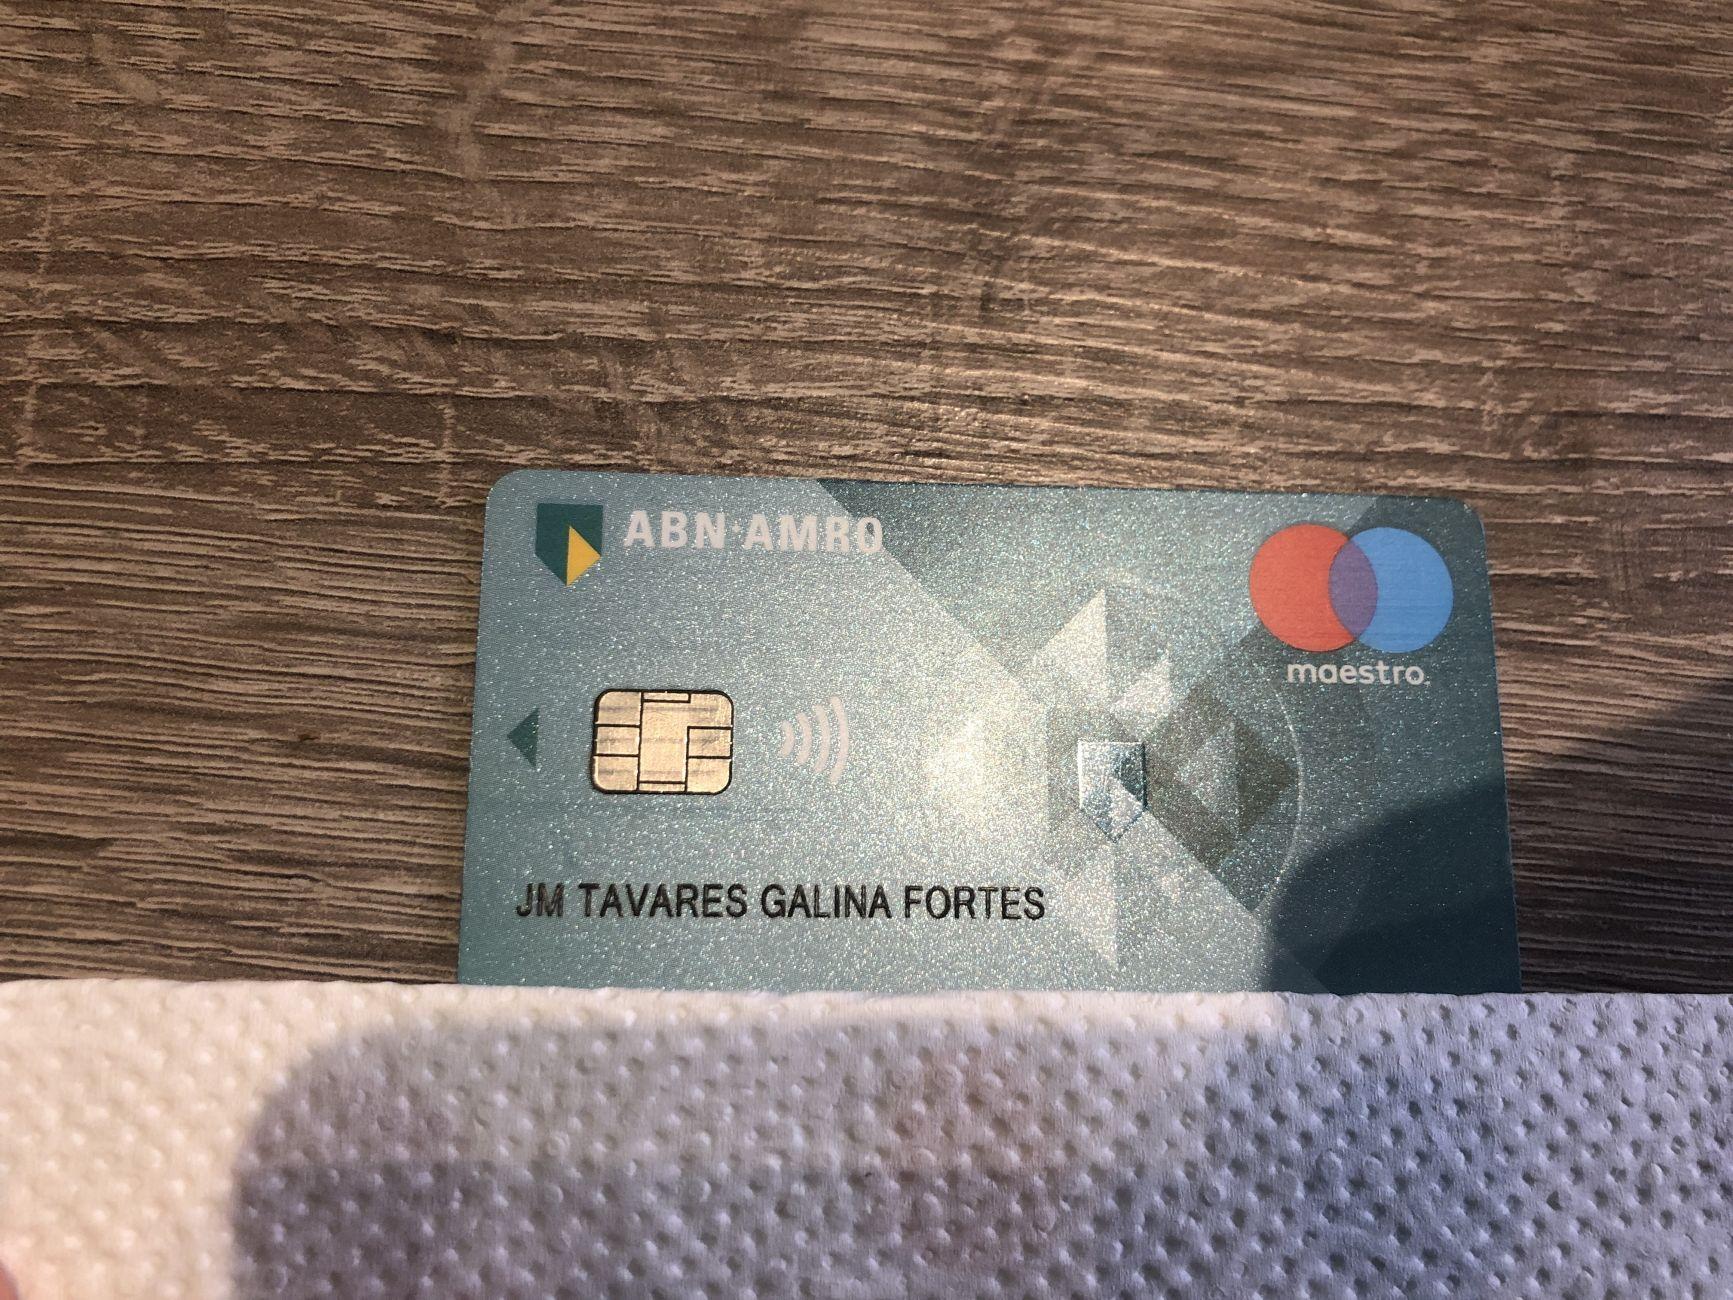 Bankpasje gevonden